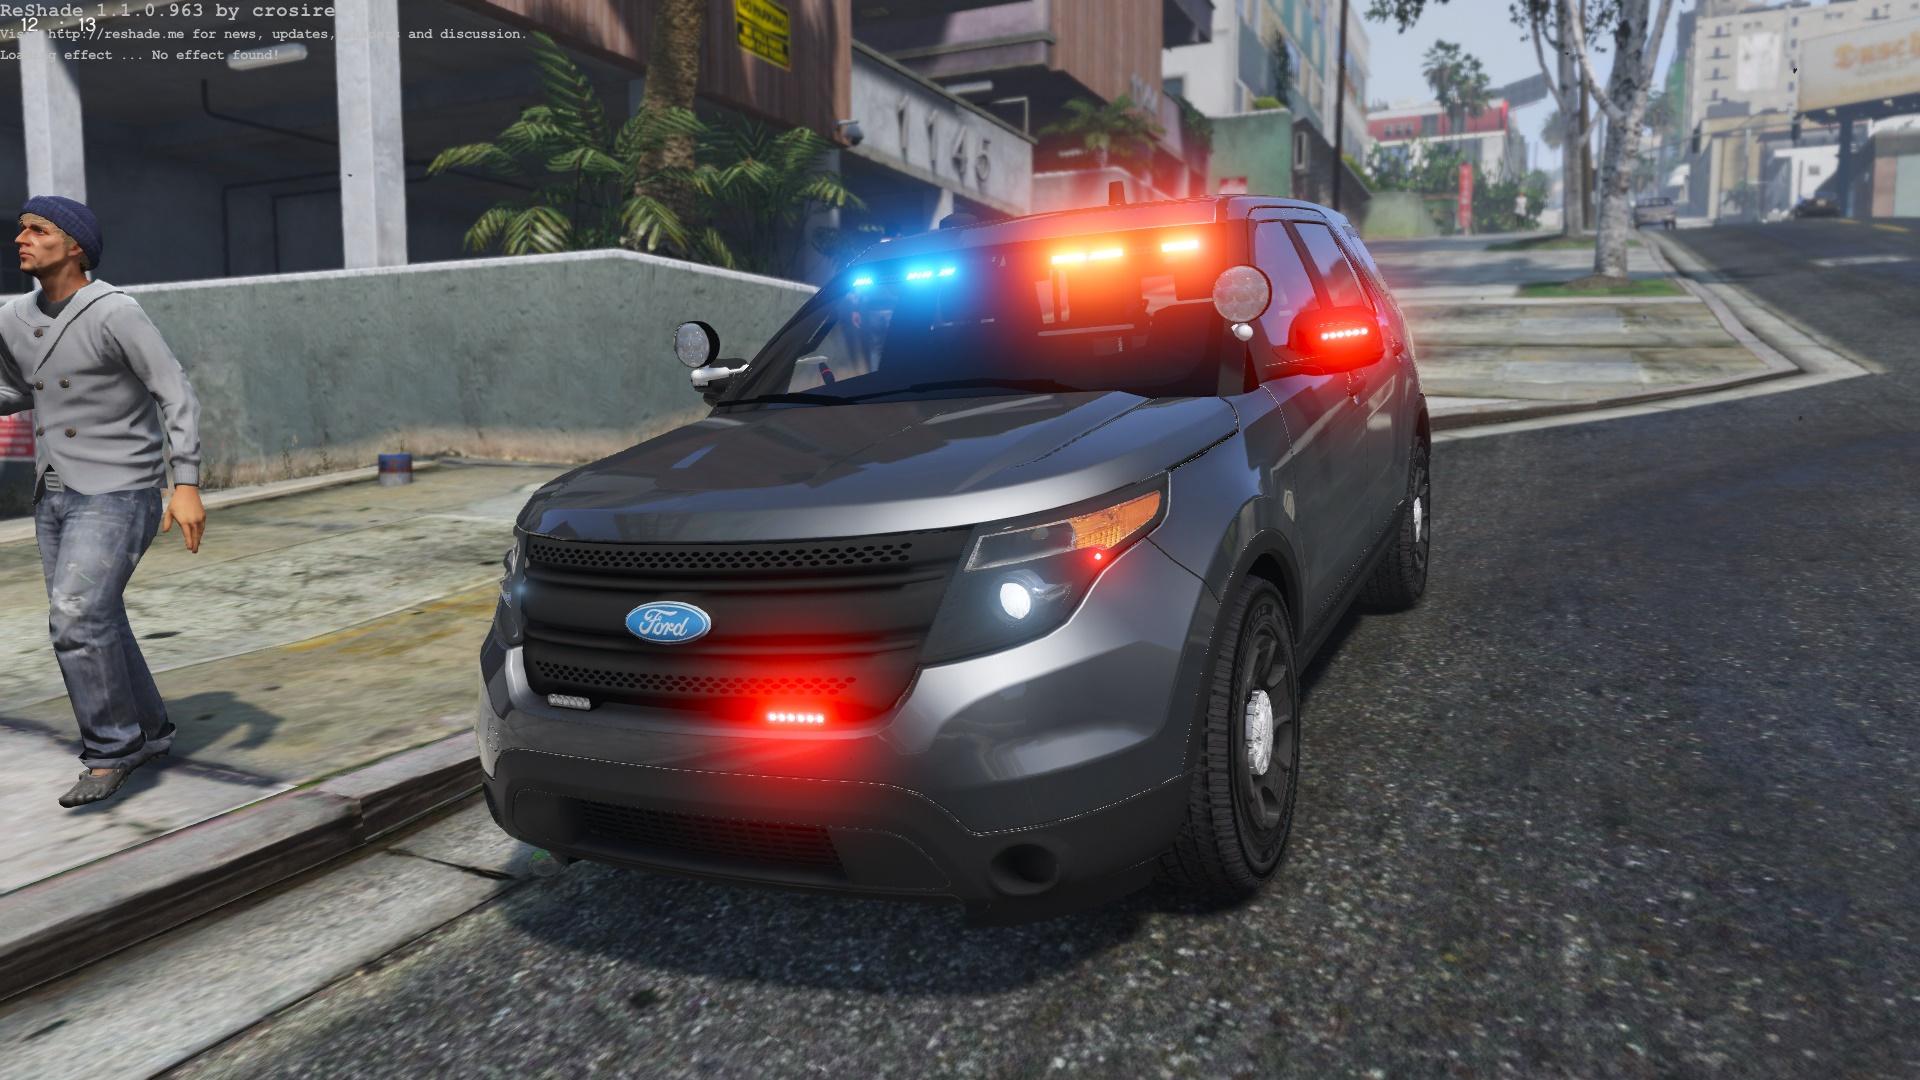 Unmarked police car gta 5 - 1f9ce8 1